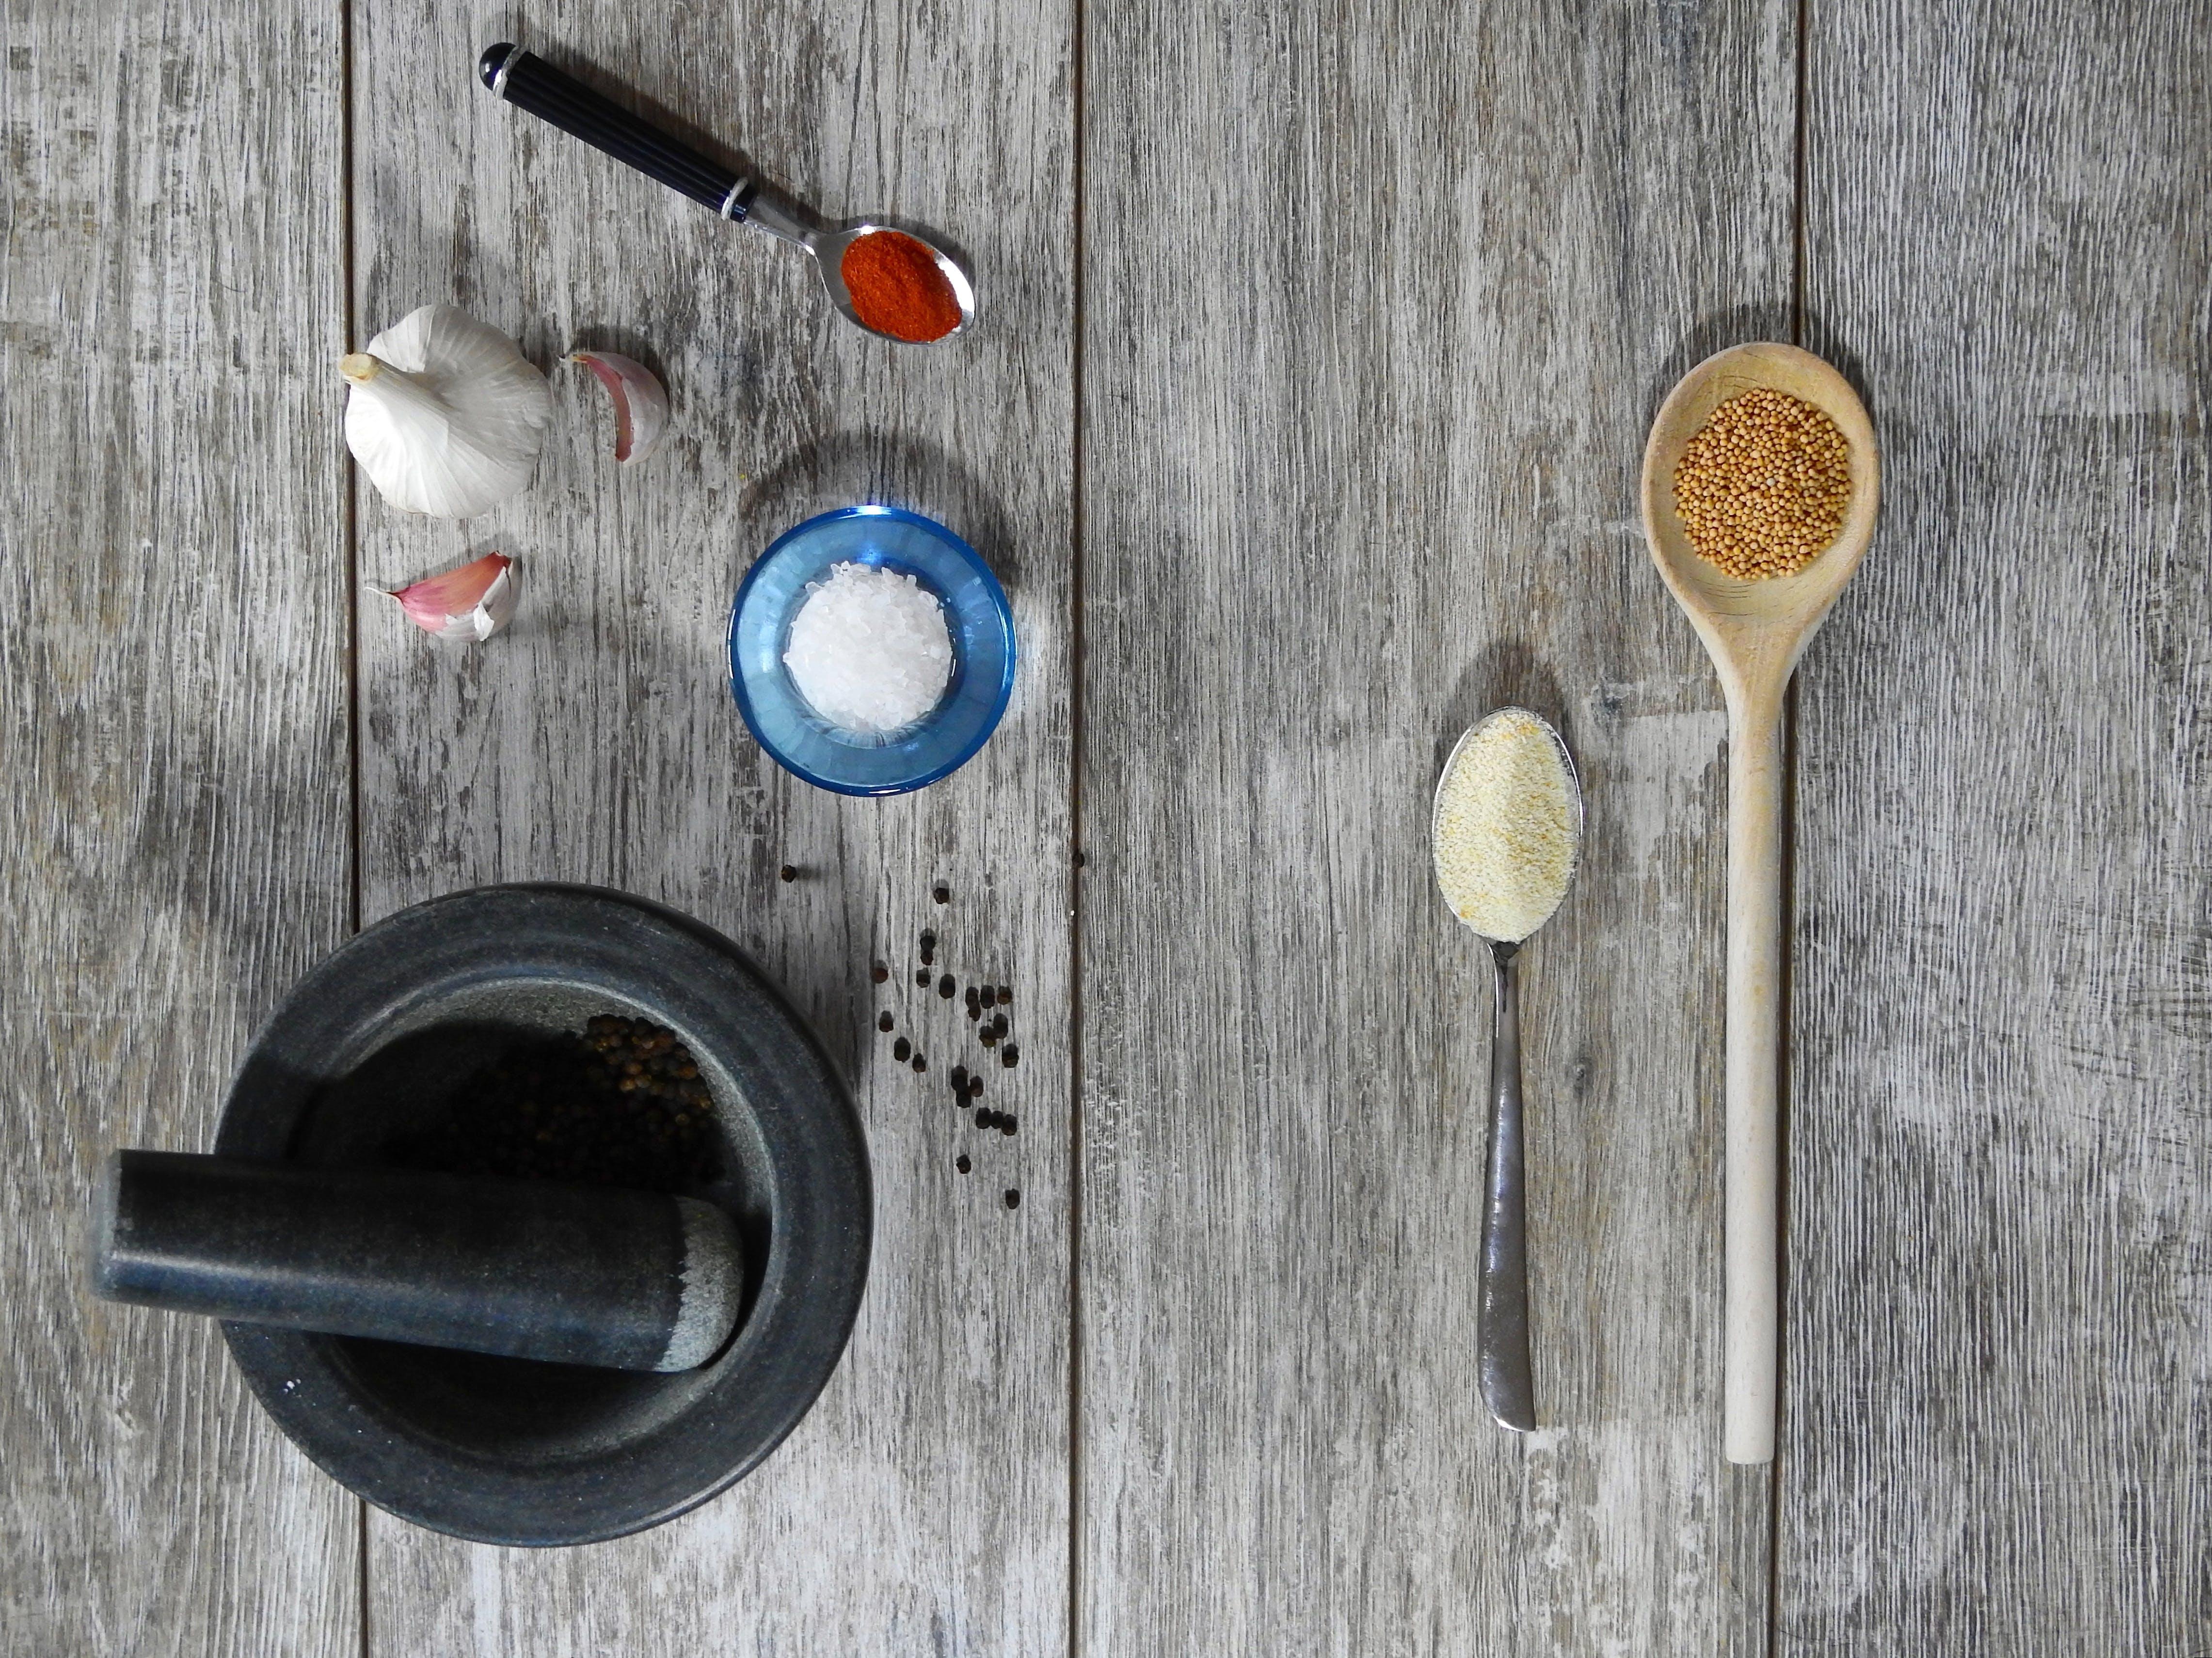 Free stock photo of food, spoon, kitchen, eat